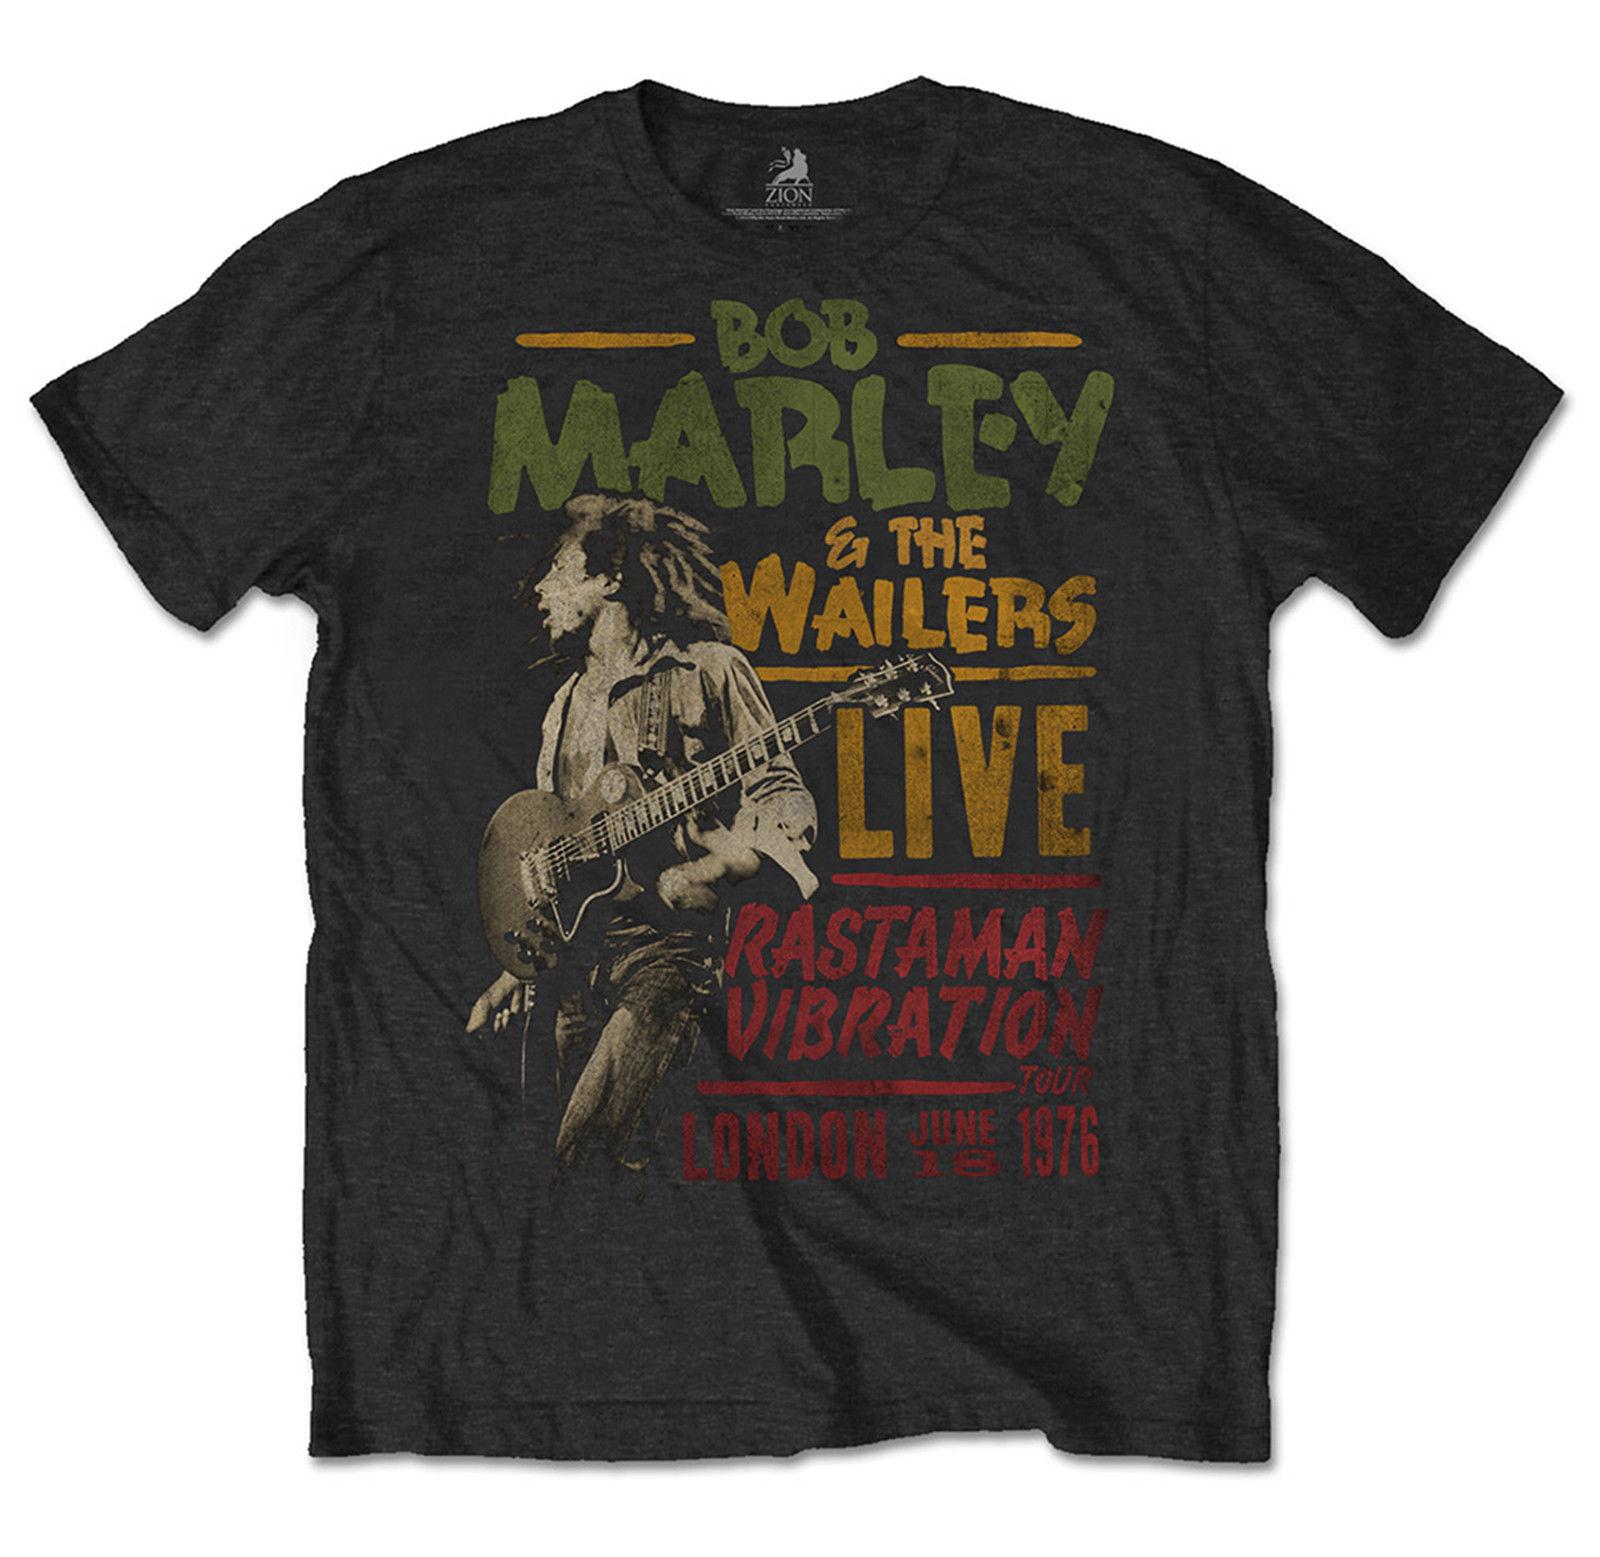 Bob Marley Camiseta Hombre Rasta vibración Tour 1976 Unisex de la música Reggae Merch nuevo Metal Casual de manga corta T-Shirt